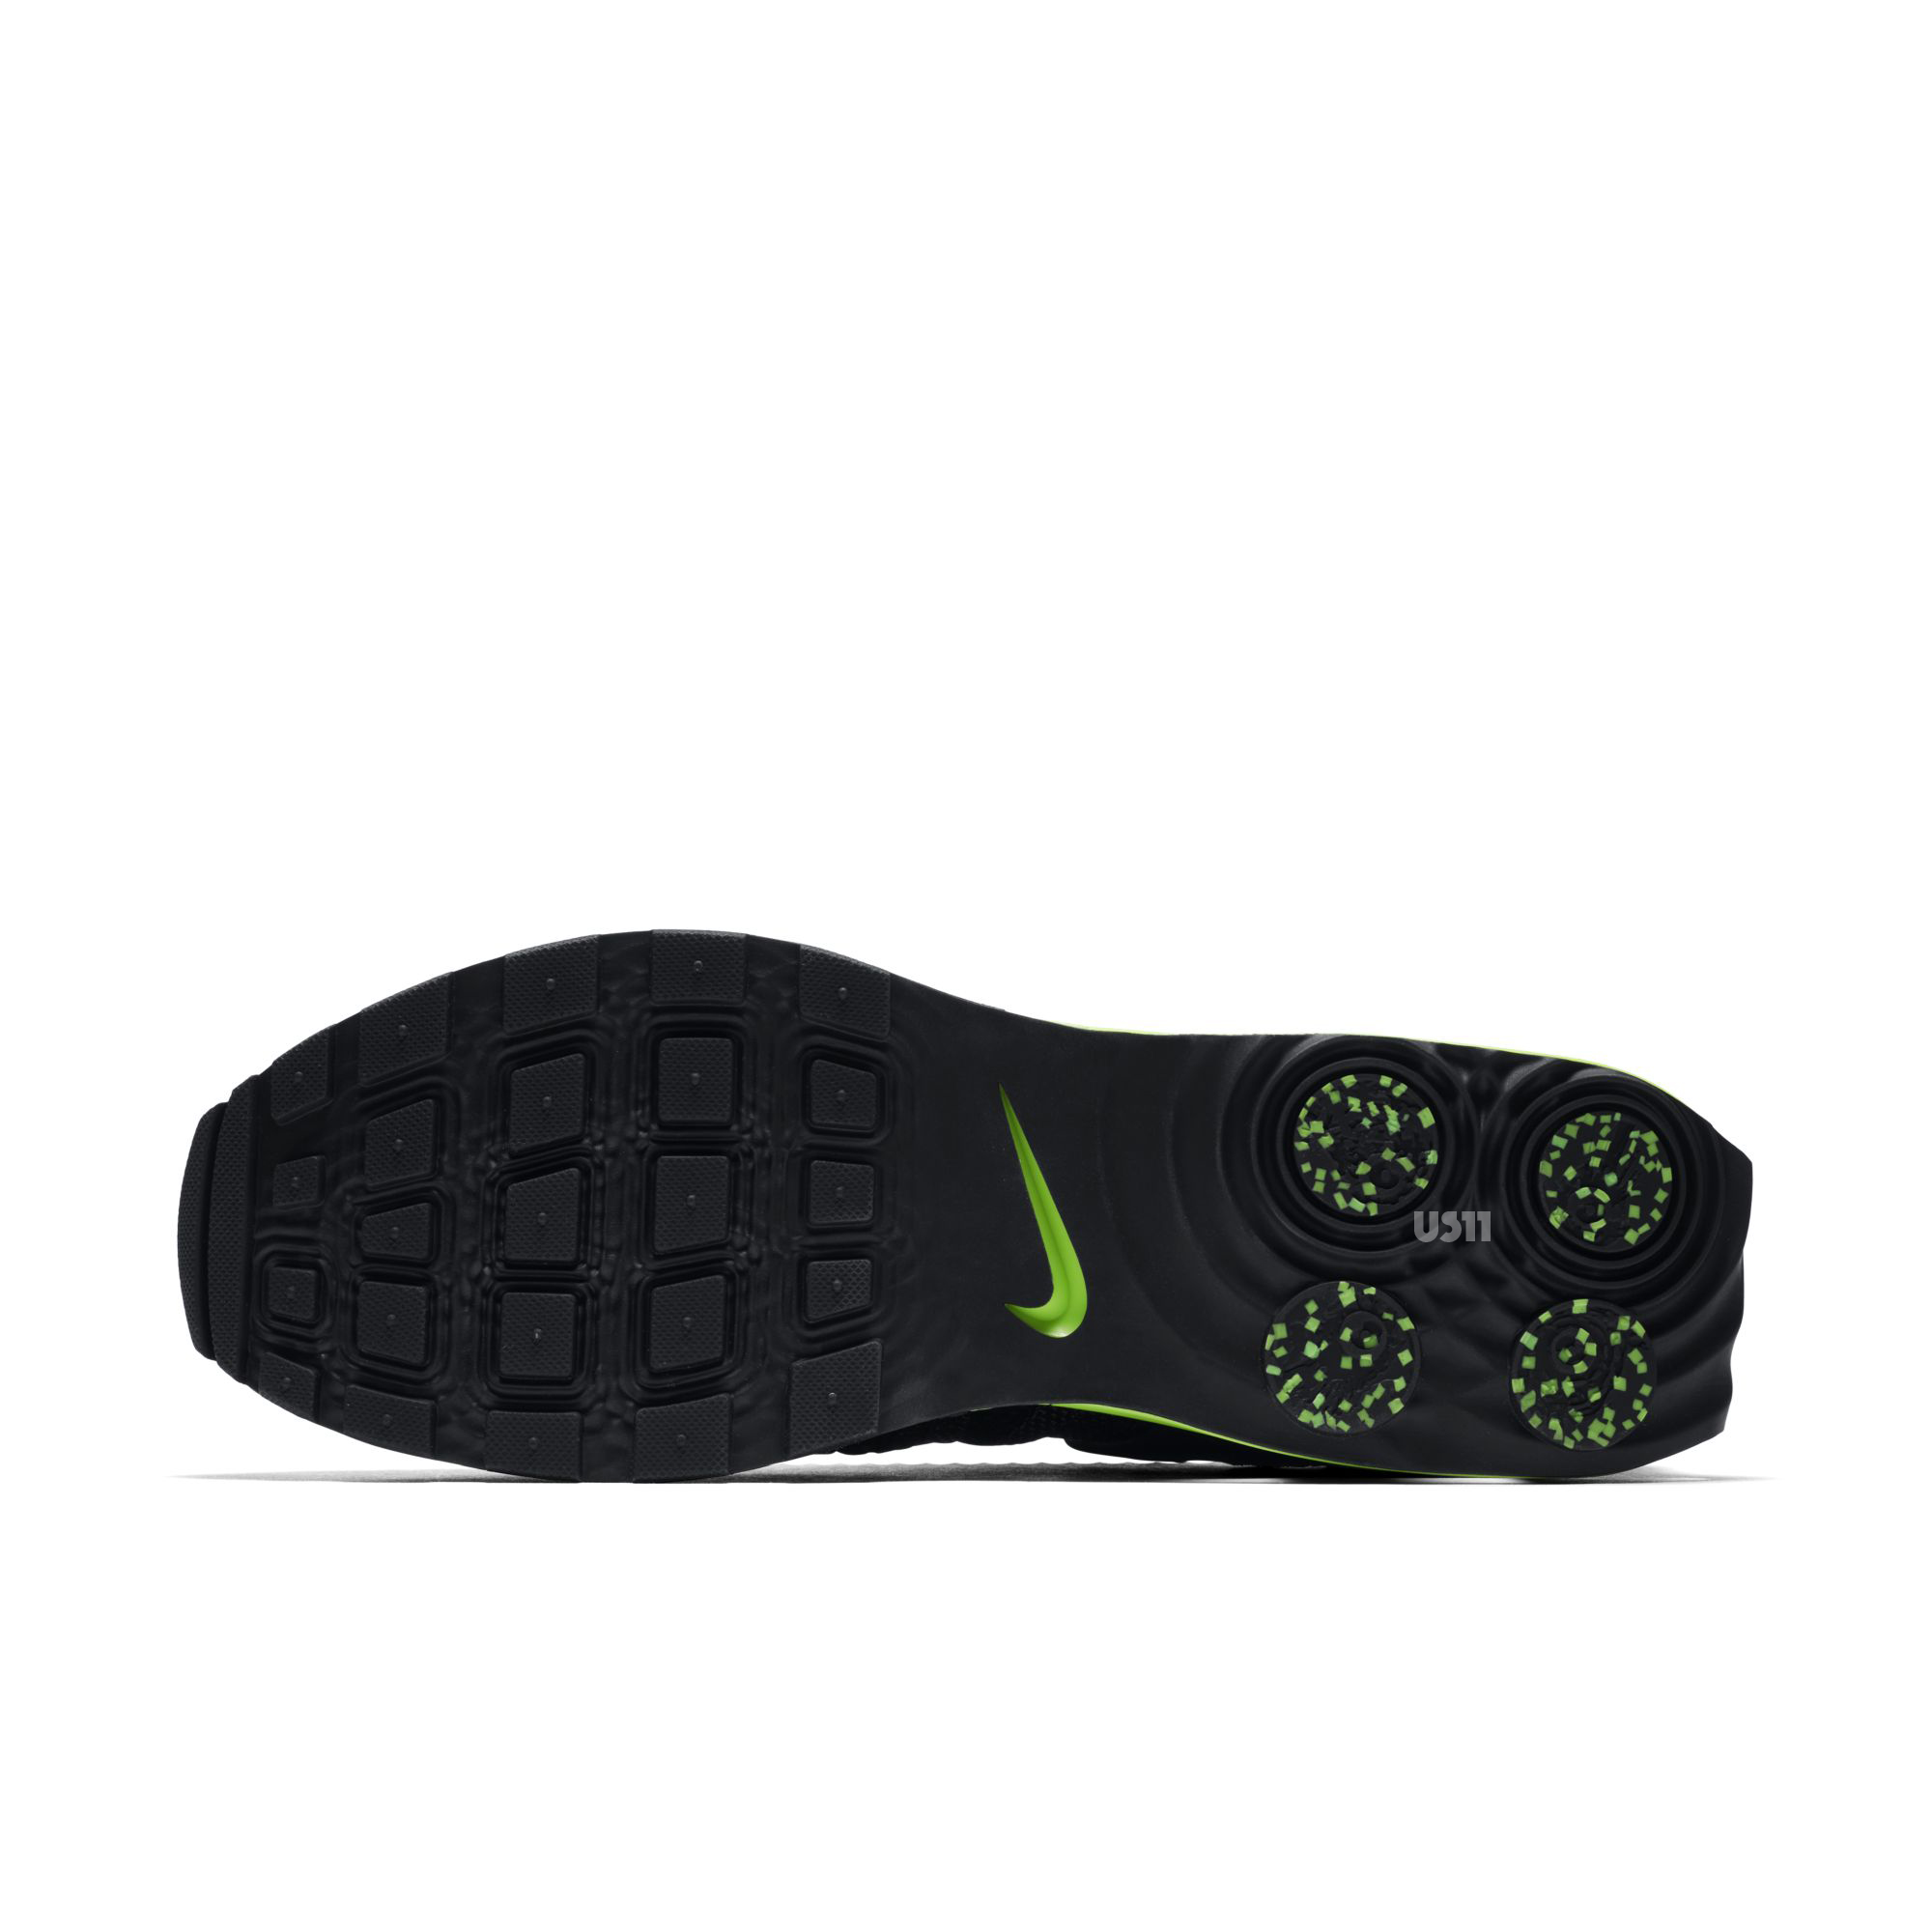 Nike Luxe Shox Gravedad DL5050Cc